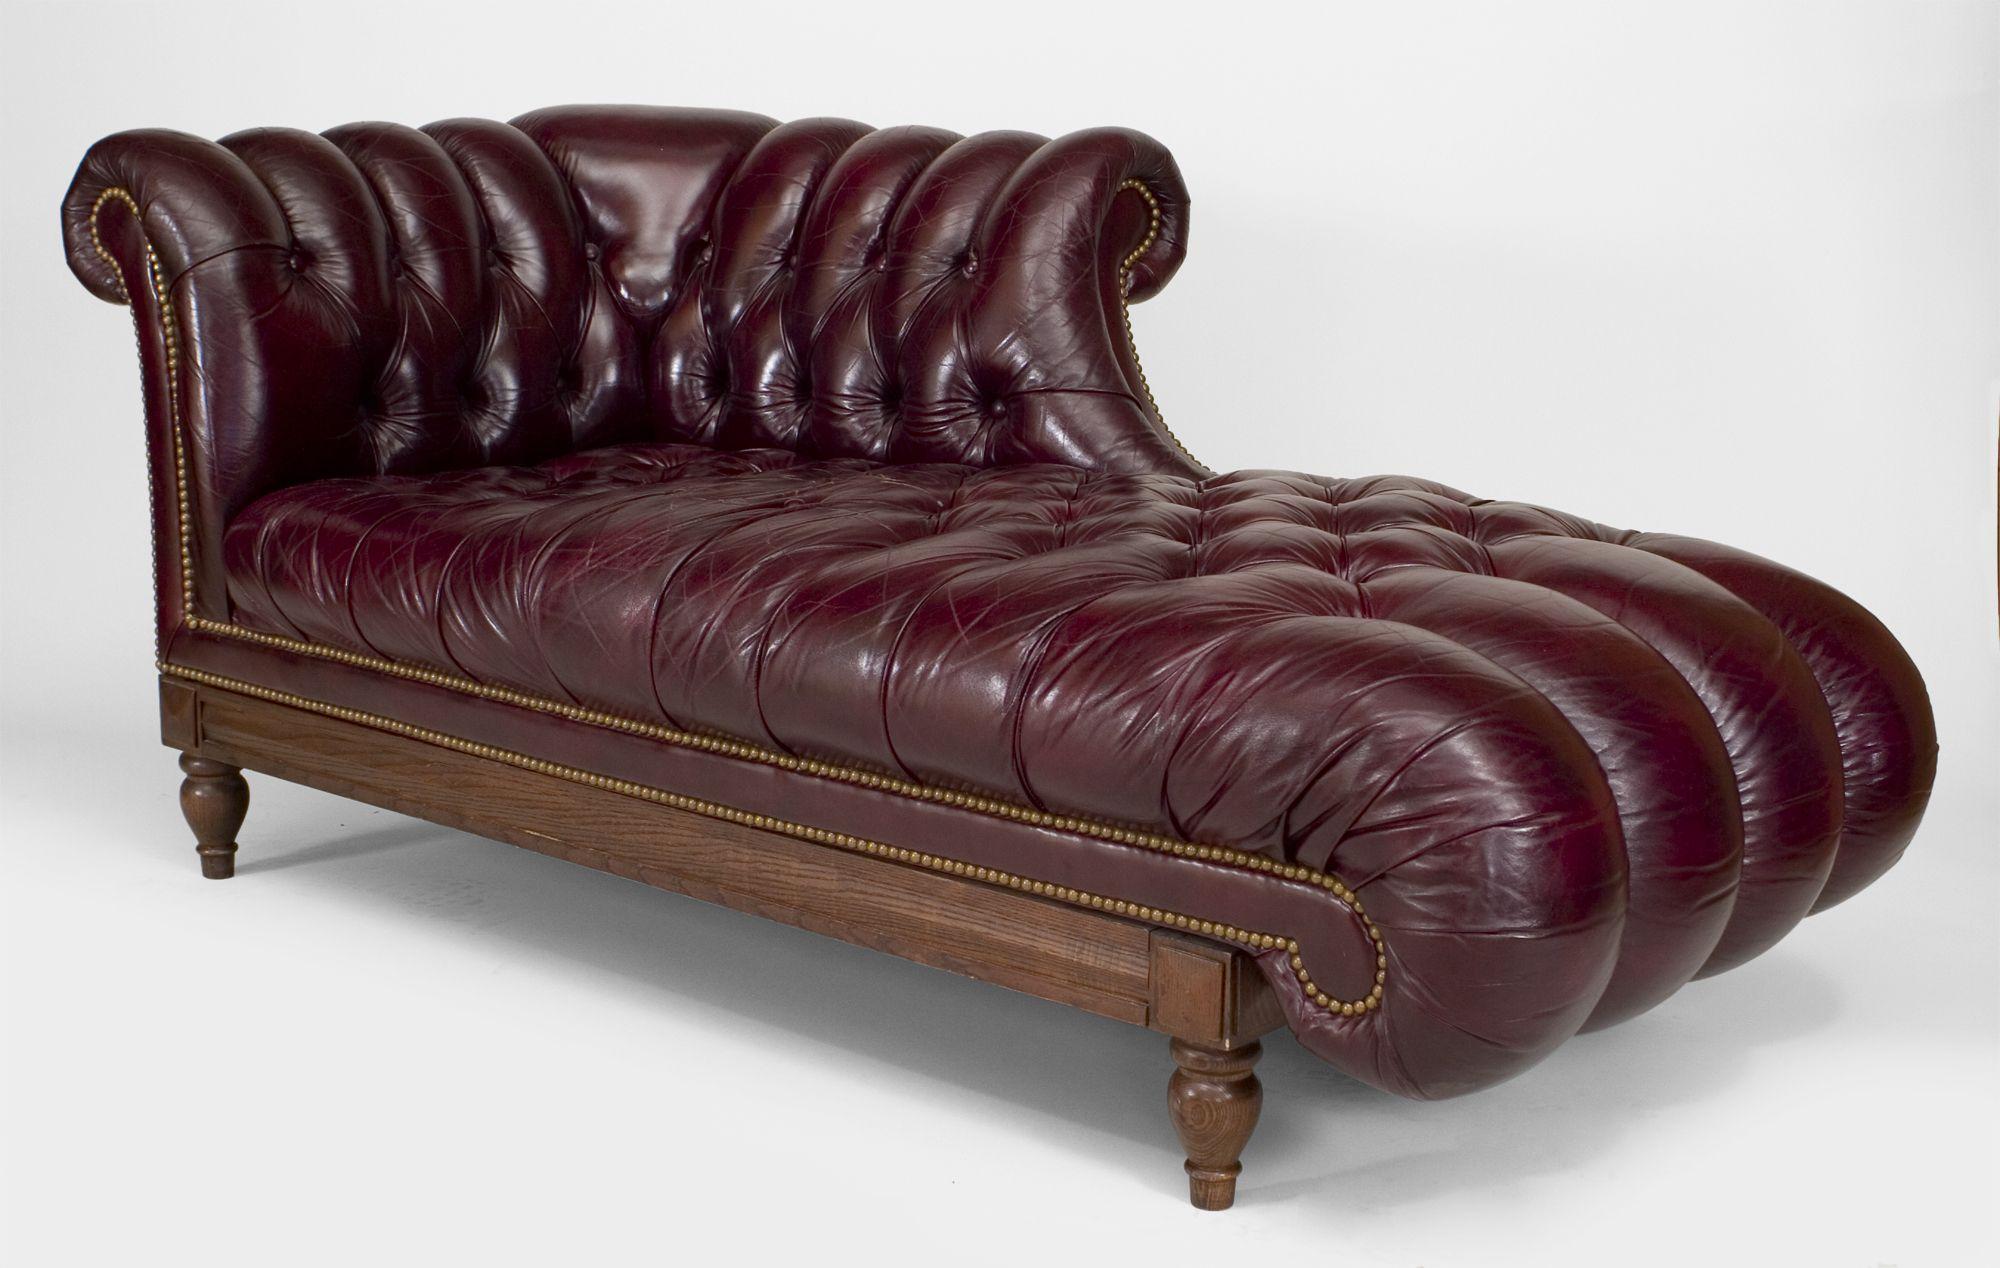 Psychiatrist Sofa Fainting Couch Sofas Chaises Ebay TheSofa